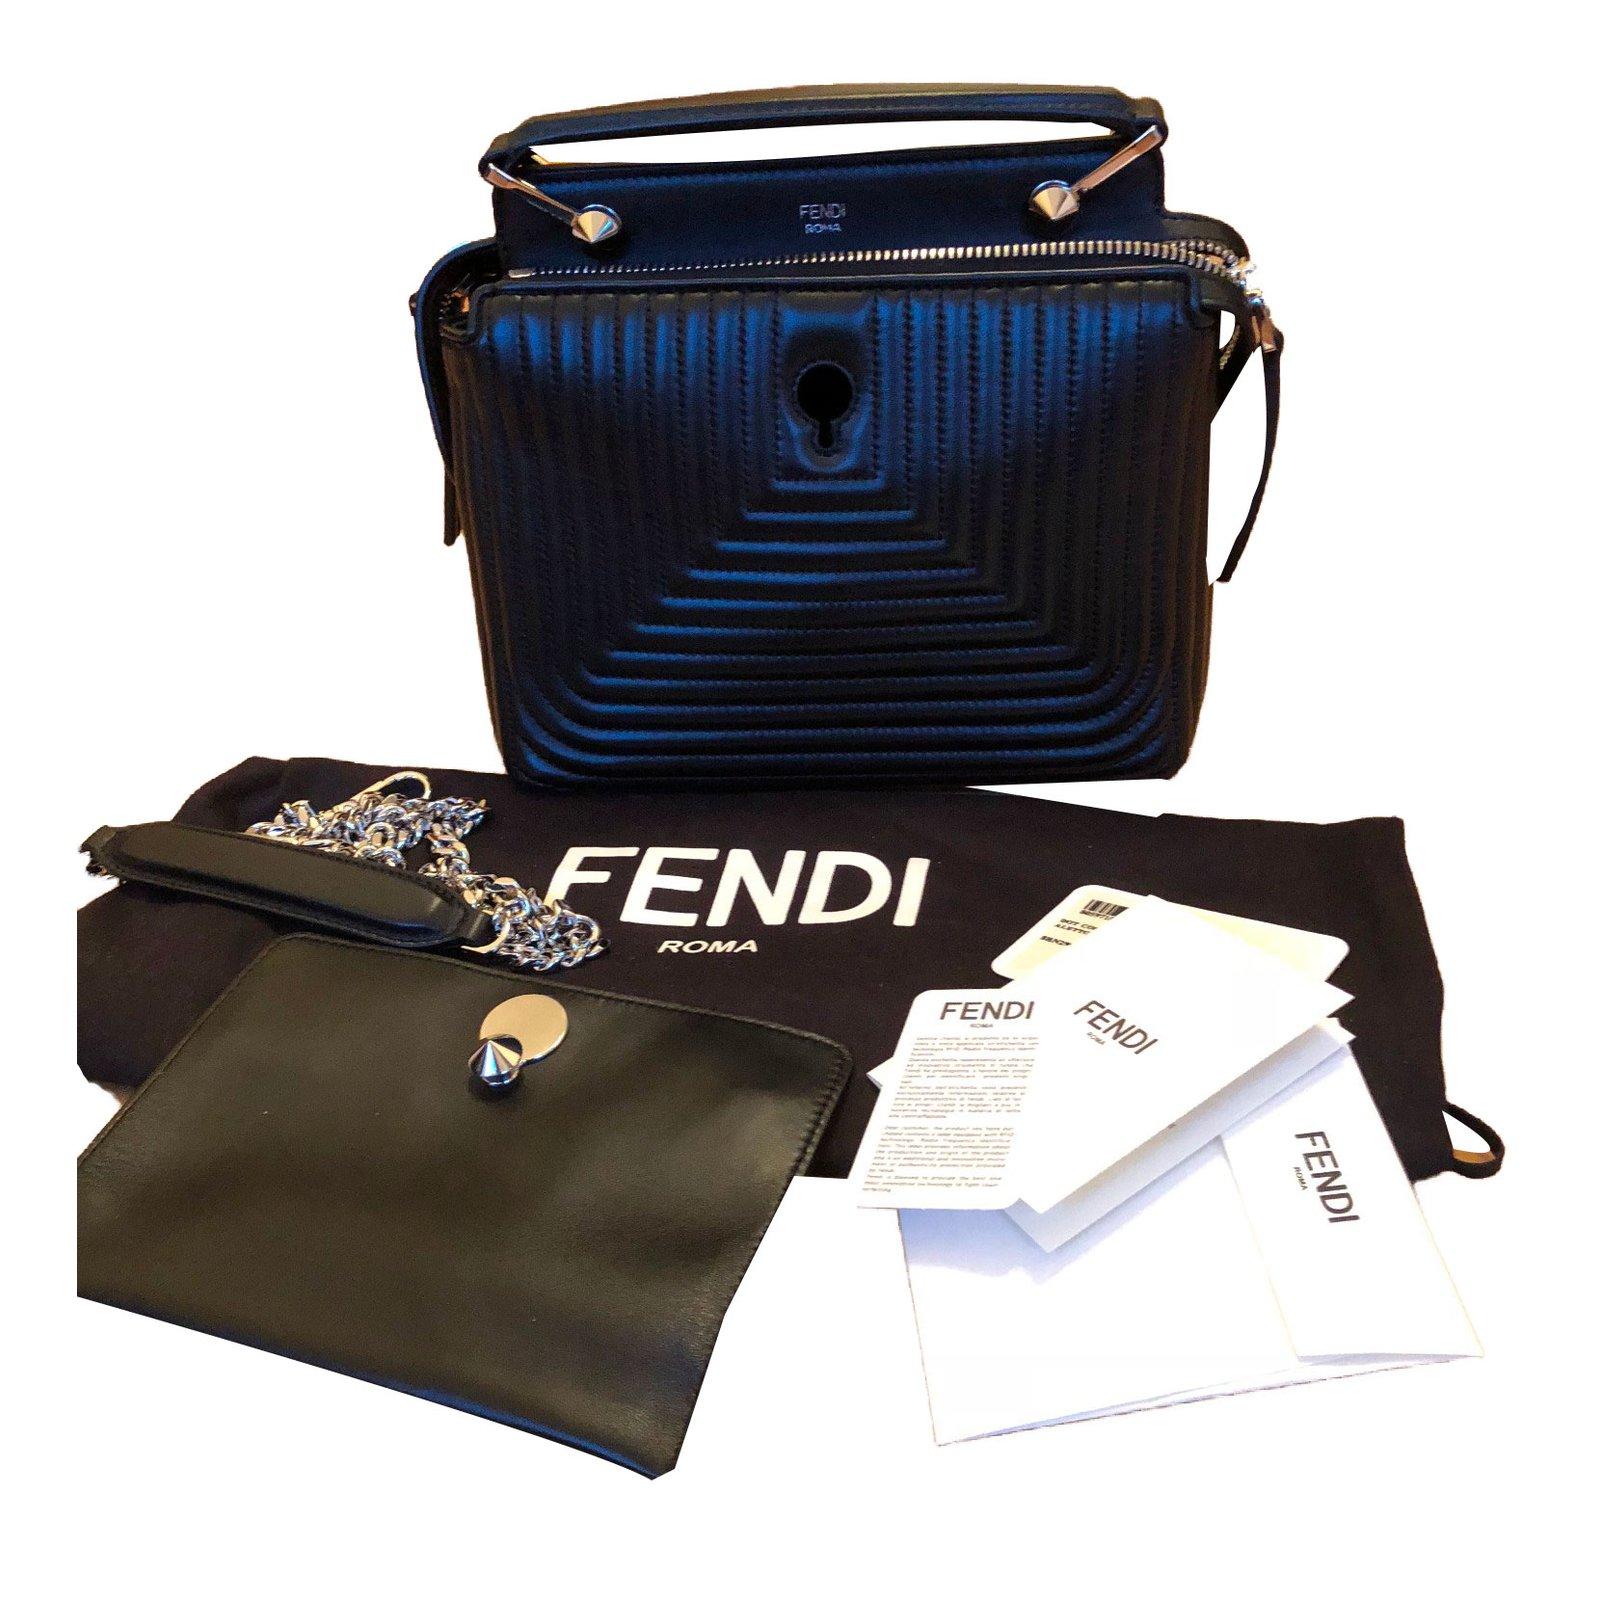 7938a641ee ... closeout fendi fendi black matelasse leather dotcom click bag in new  condition handbags leather black ref ...